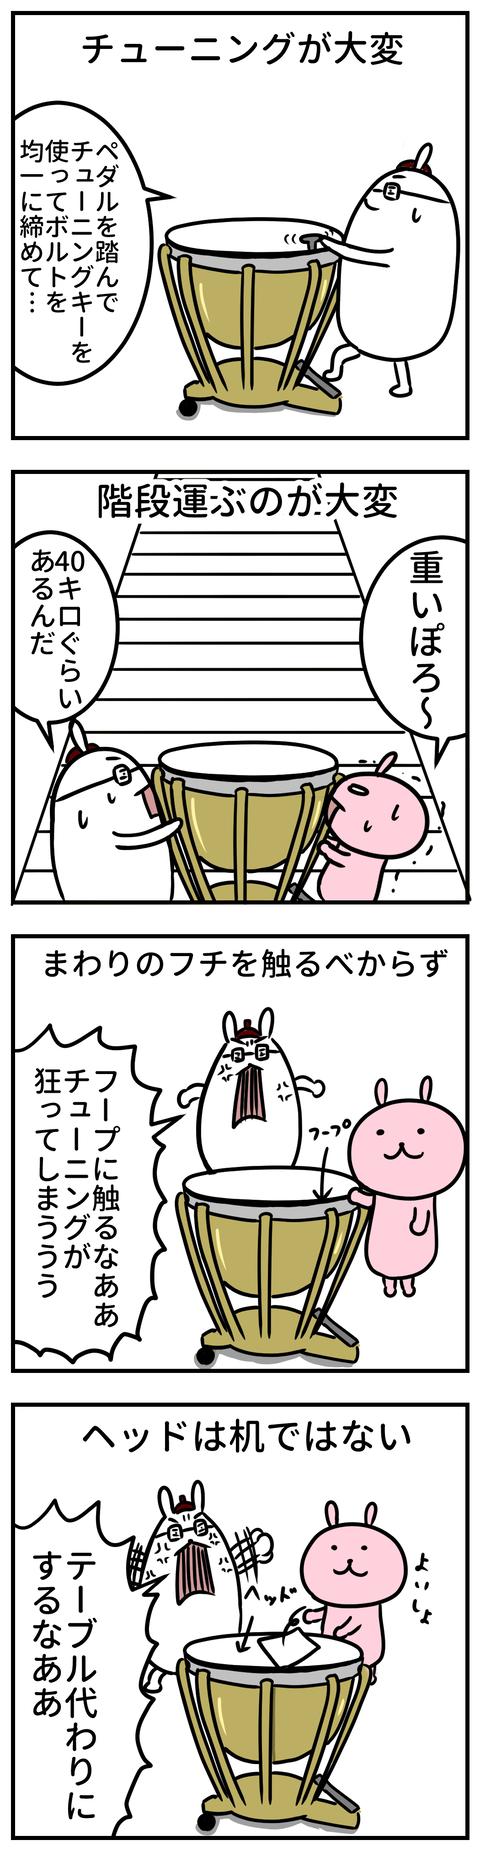 manga-yuzuporo62-1